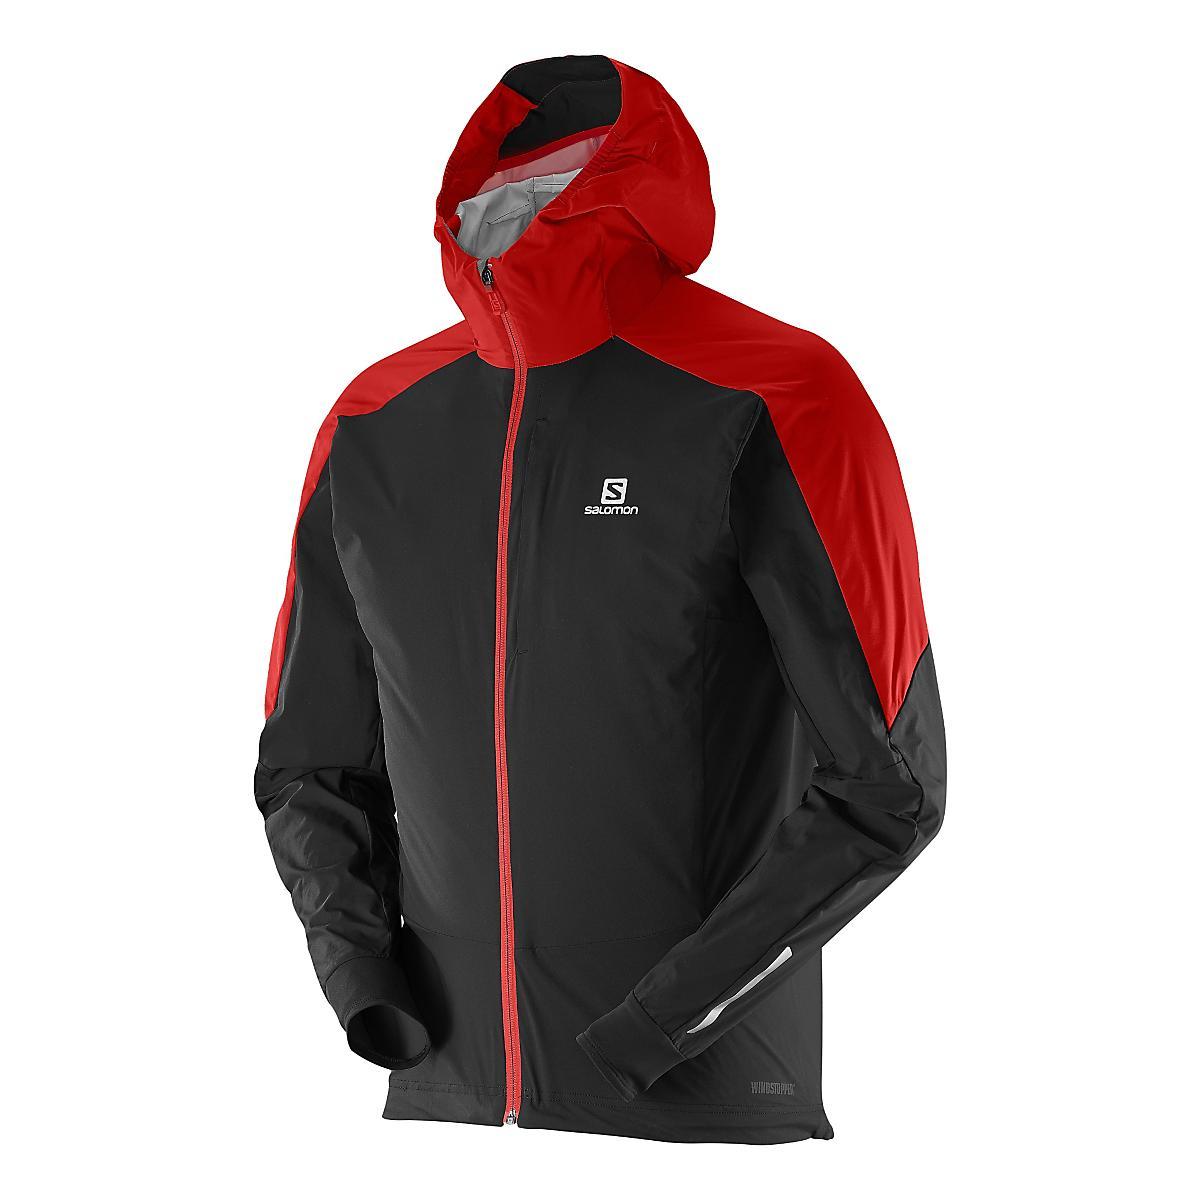 b7900e33d9b Mens Salomon Equipe WS Warm Up Hooded Jackets at Road Runner Sports